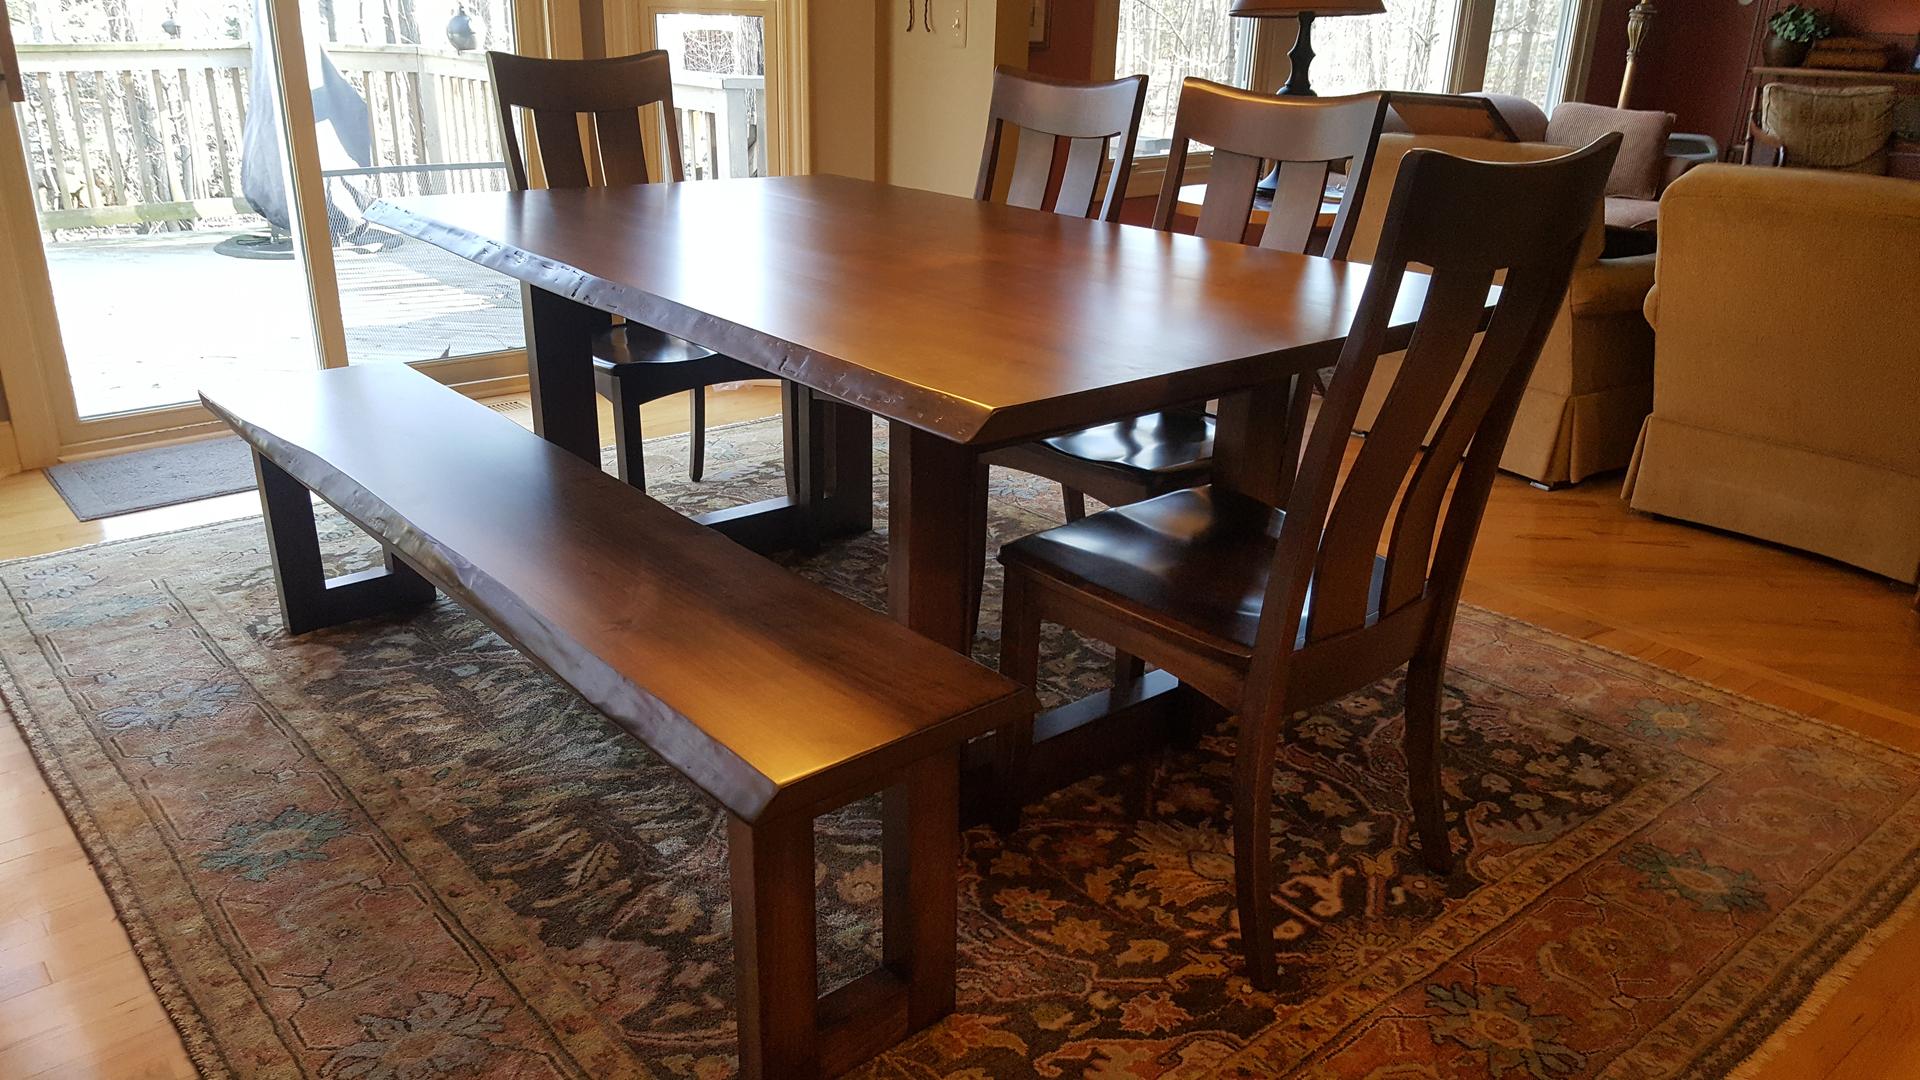 Surprising Only Amish Handcrafted Hardwood Furniture Chelsea Mi Home Interior And Landscaping Oversignezvosmurscom